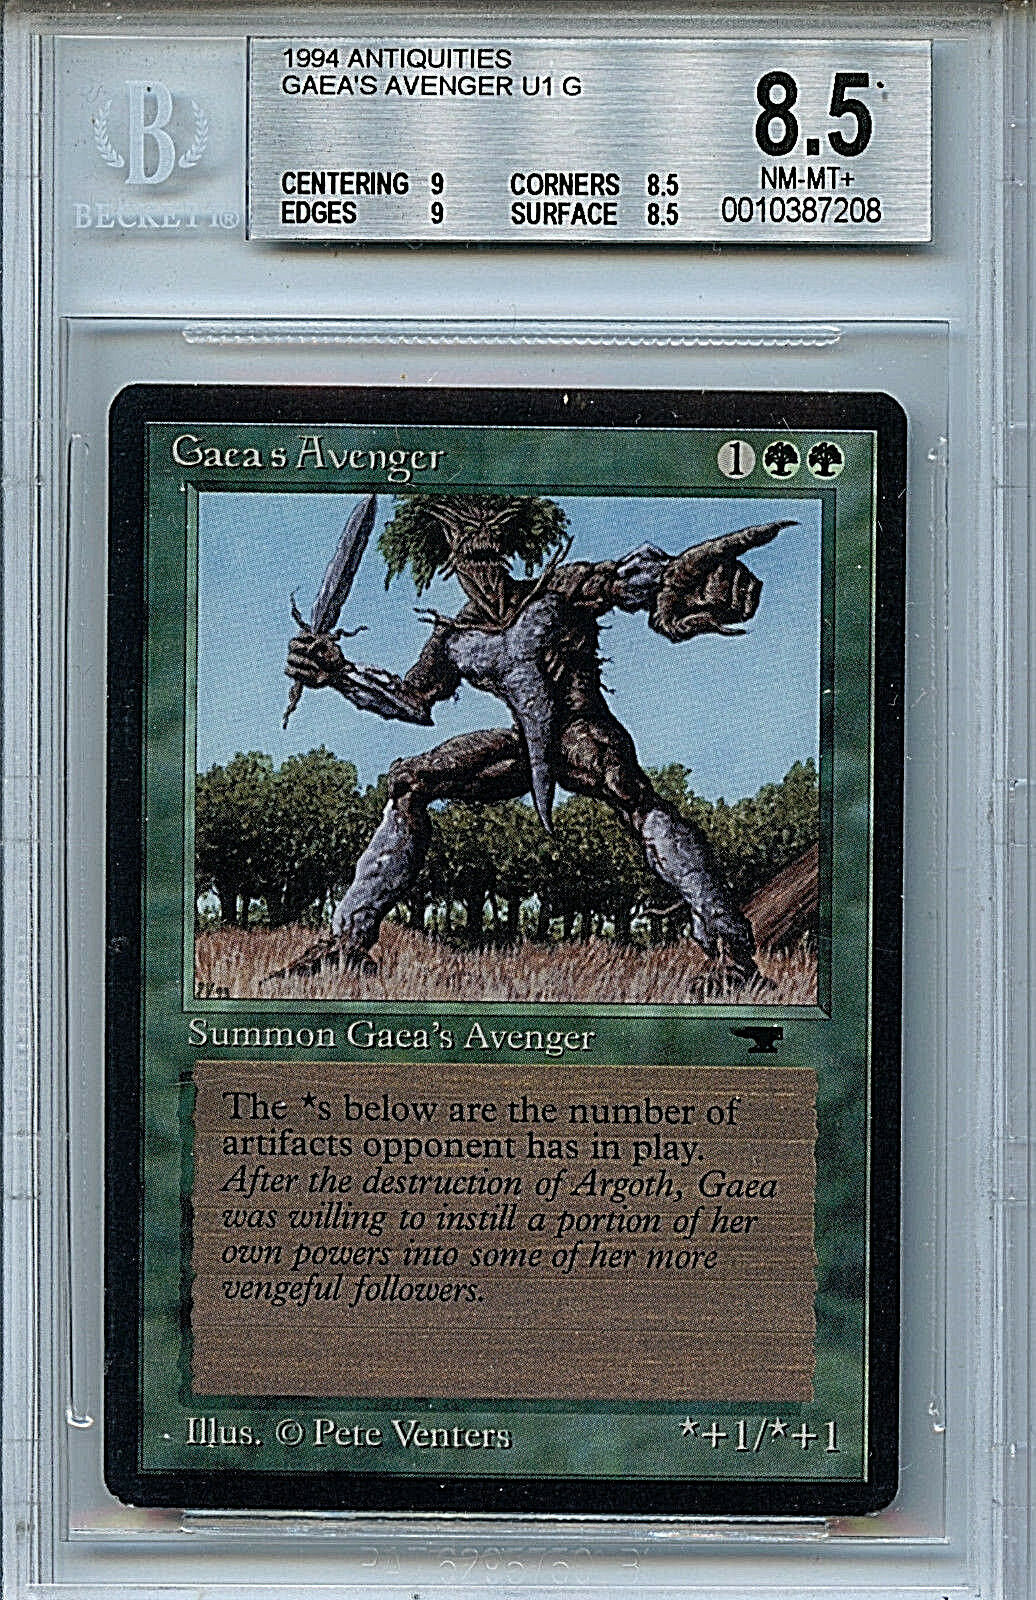 MTG Antiquities Gaea's Avenger BGS 8.5 8.5 8.5  NM-MT+ Magic Card 7208 48e2f6